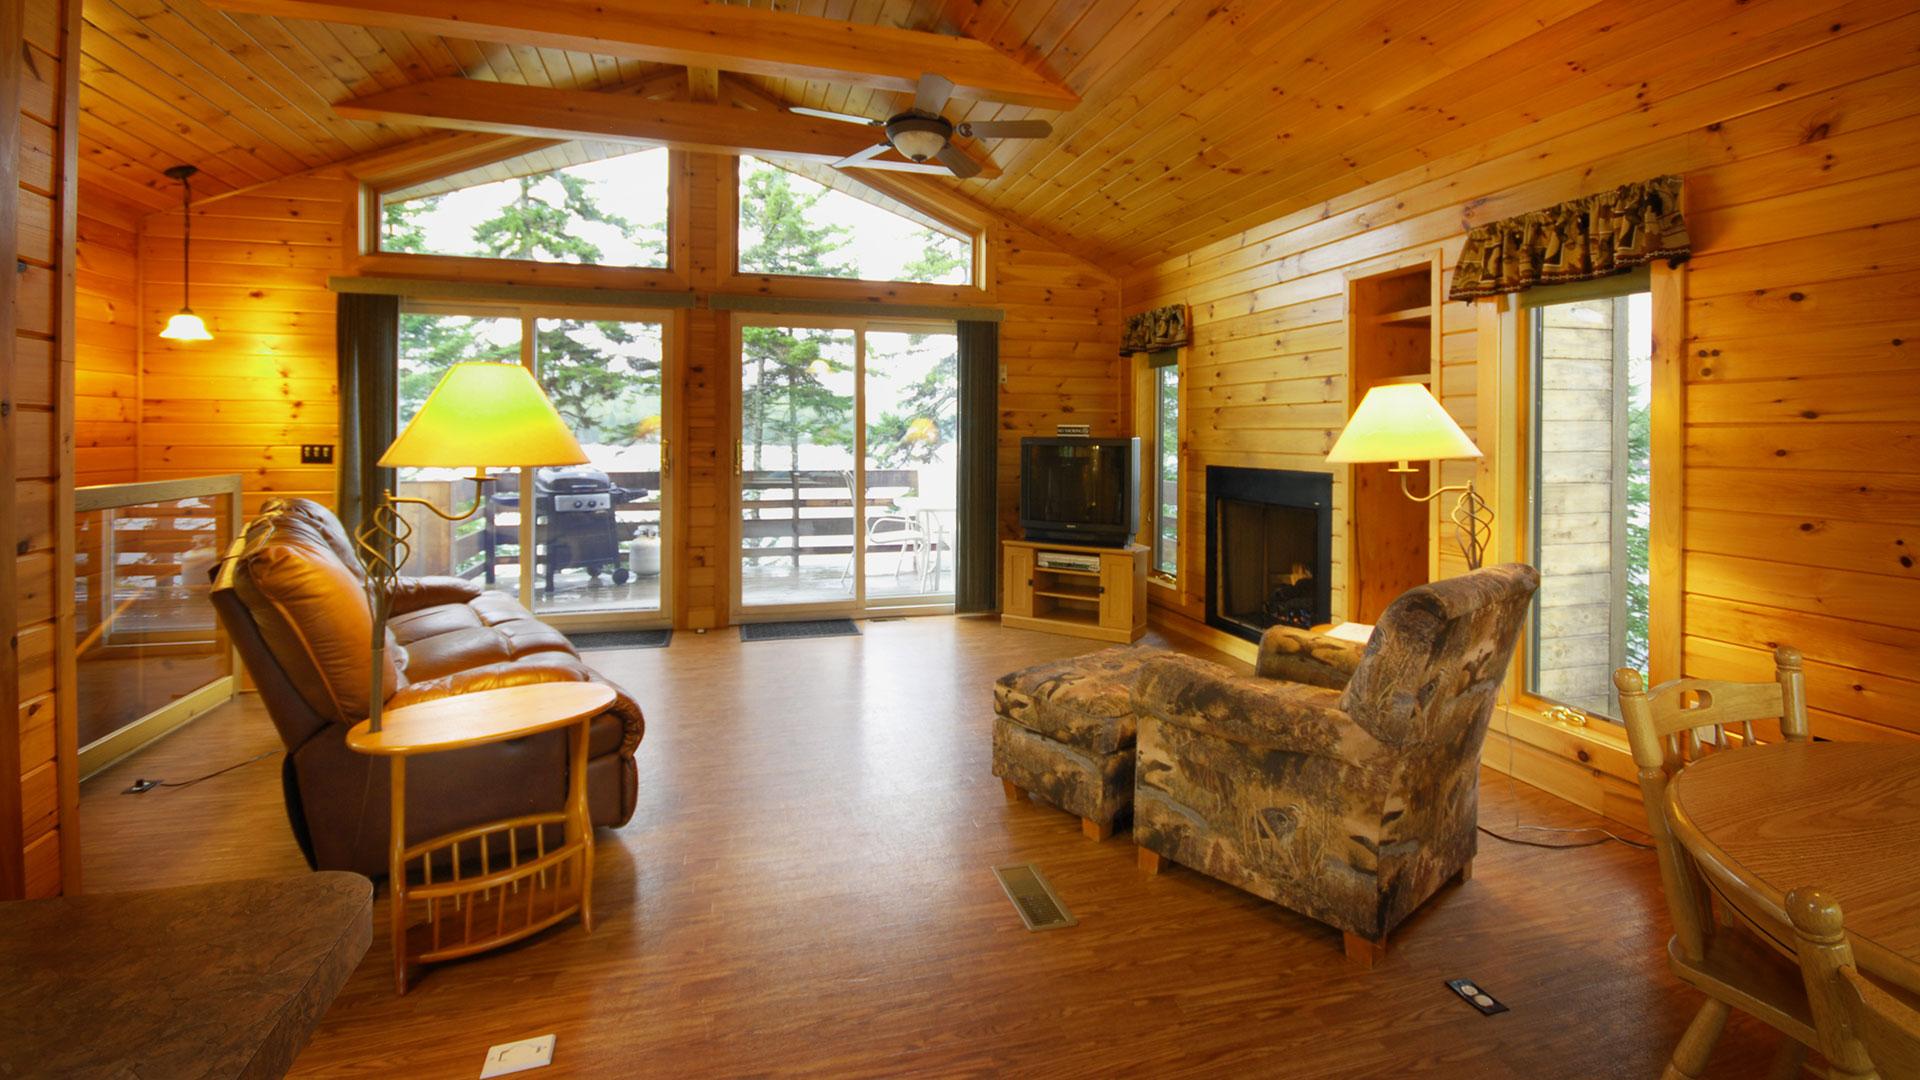 web cabin cabins stream riffles nh lopstick perry room living rentals